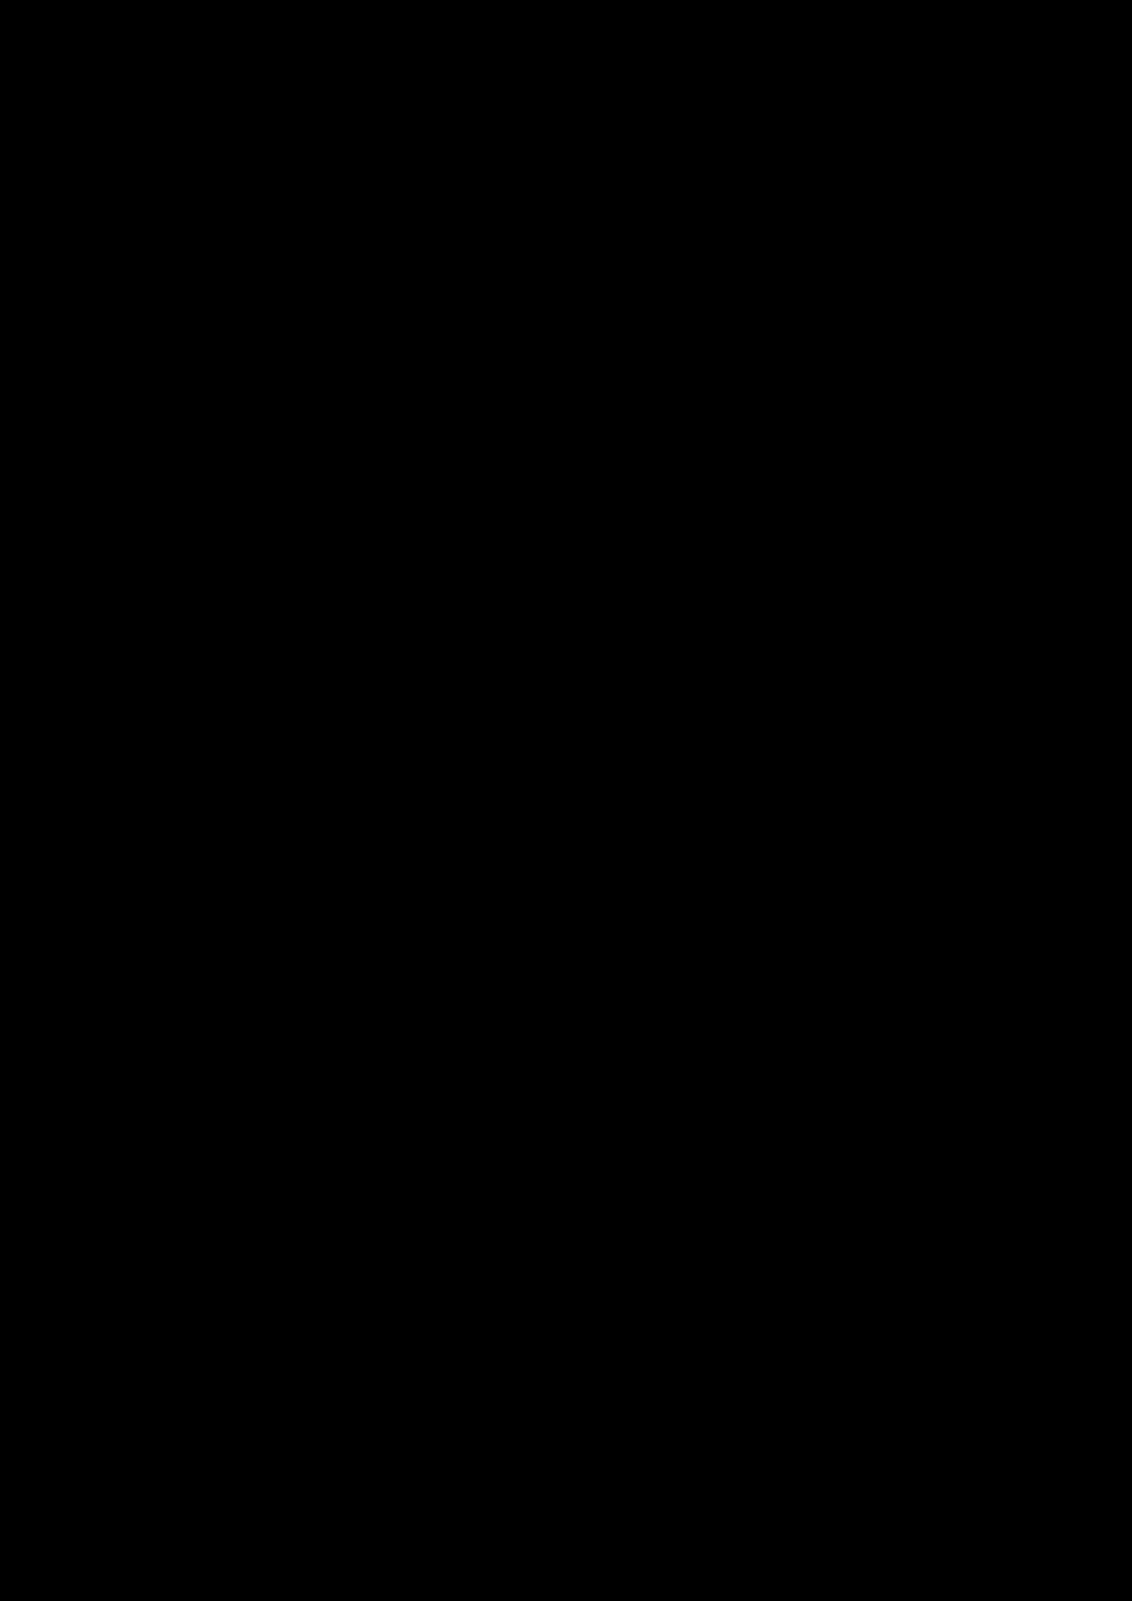 Korolevstvo slez slide, Image 6